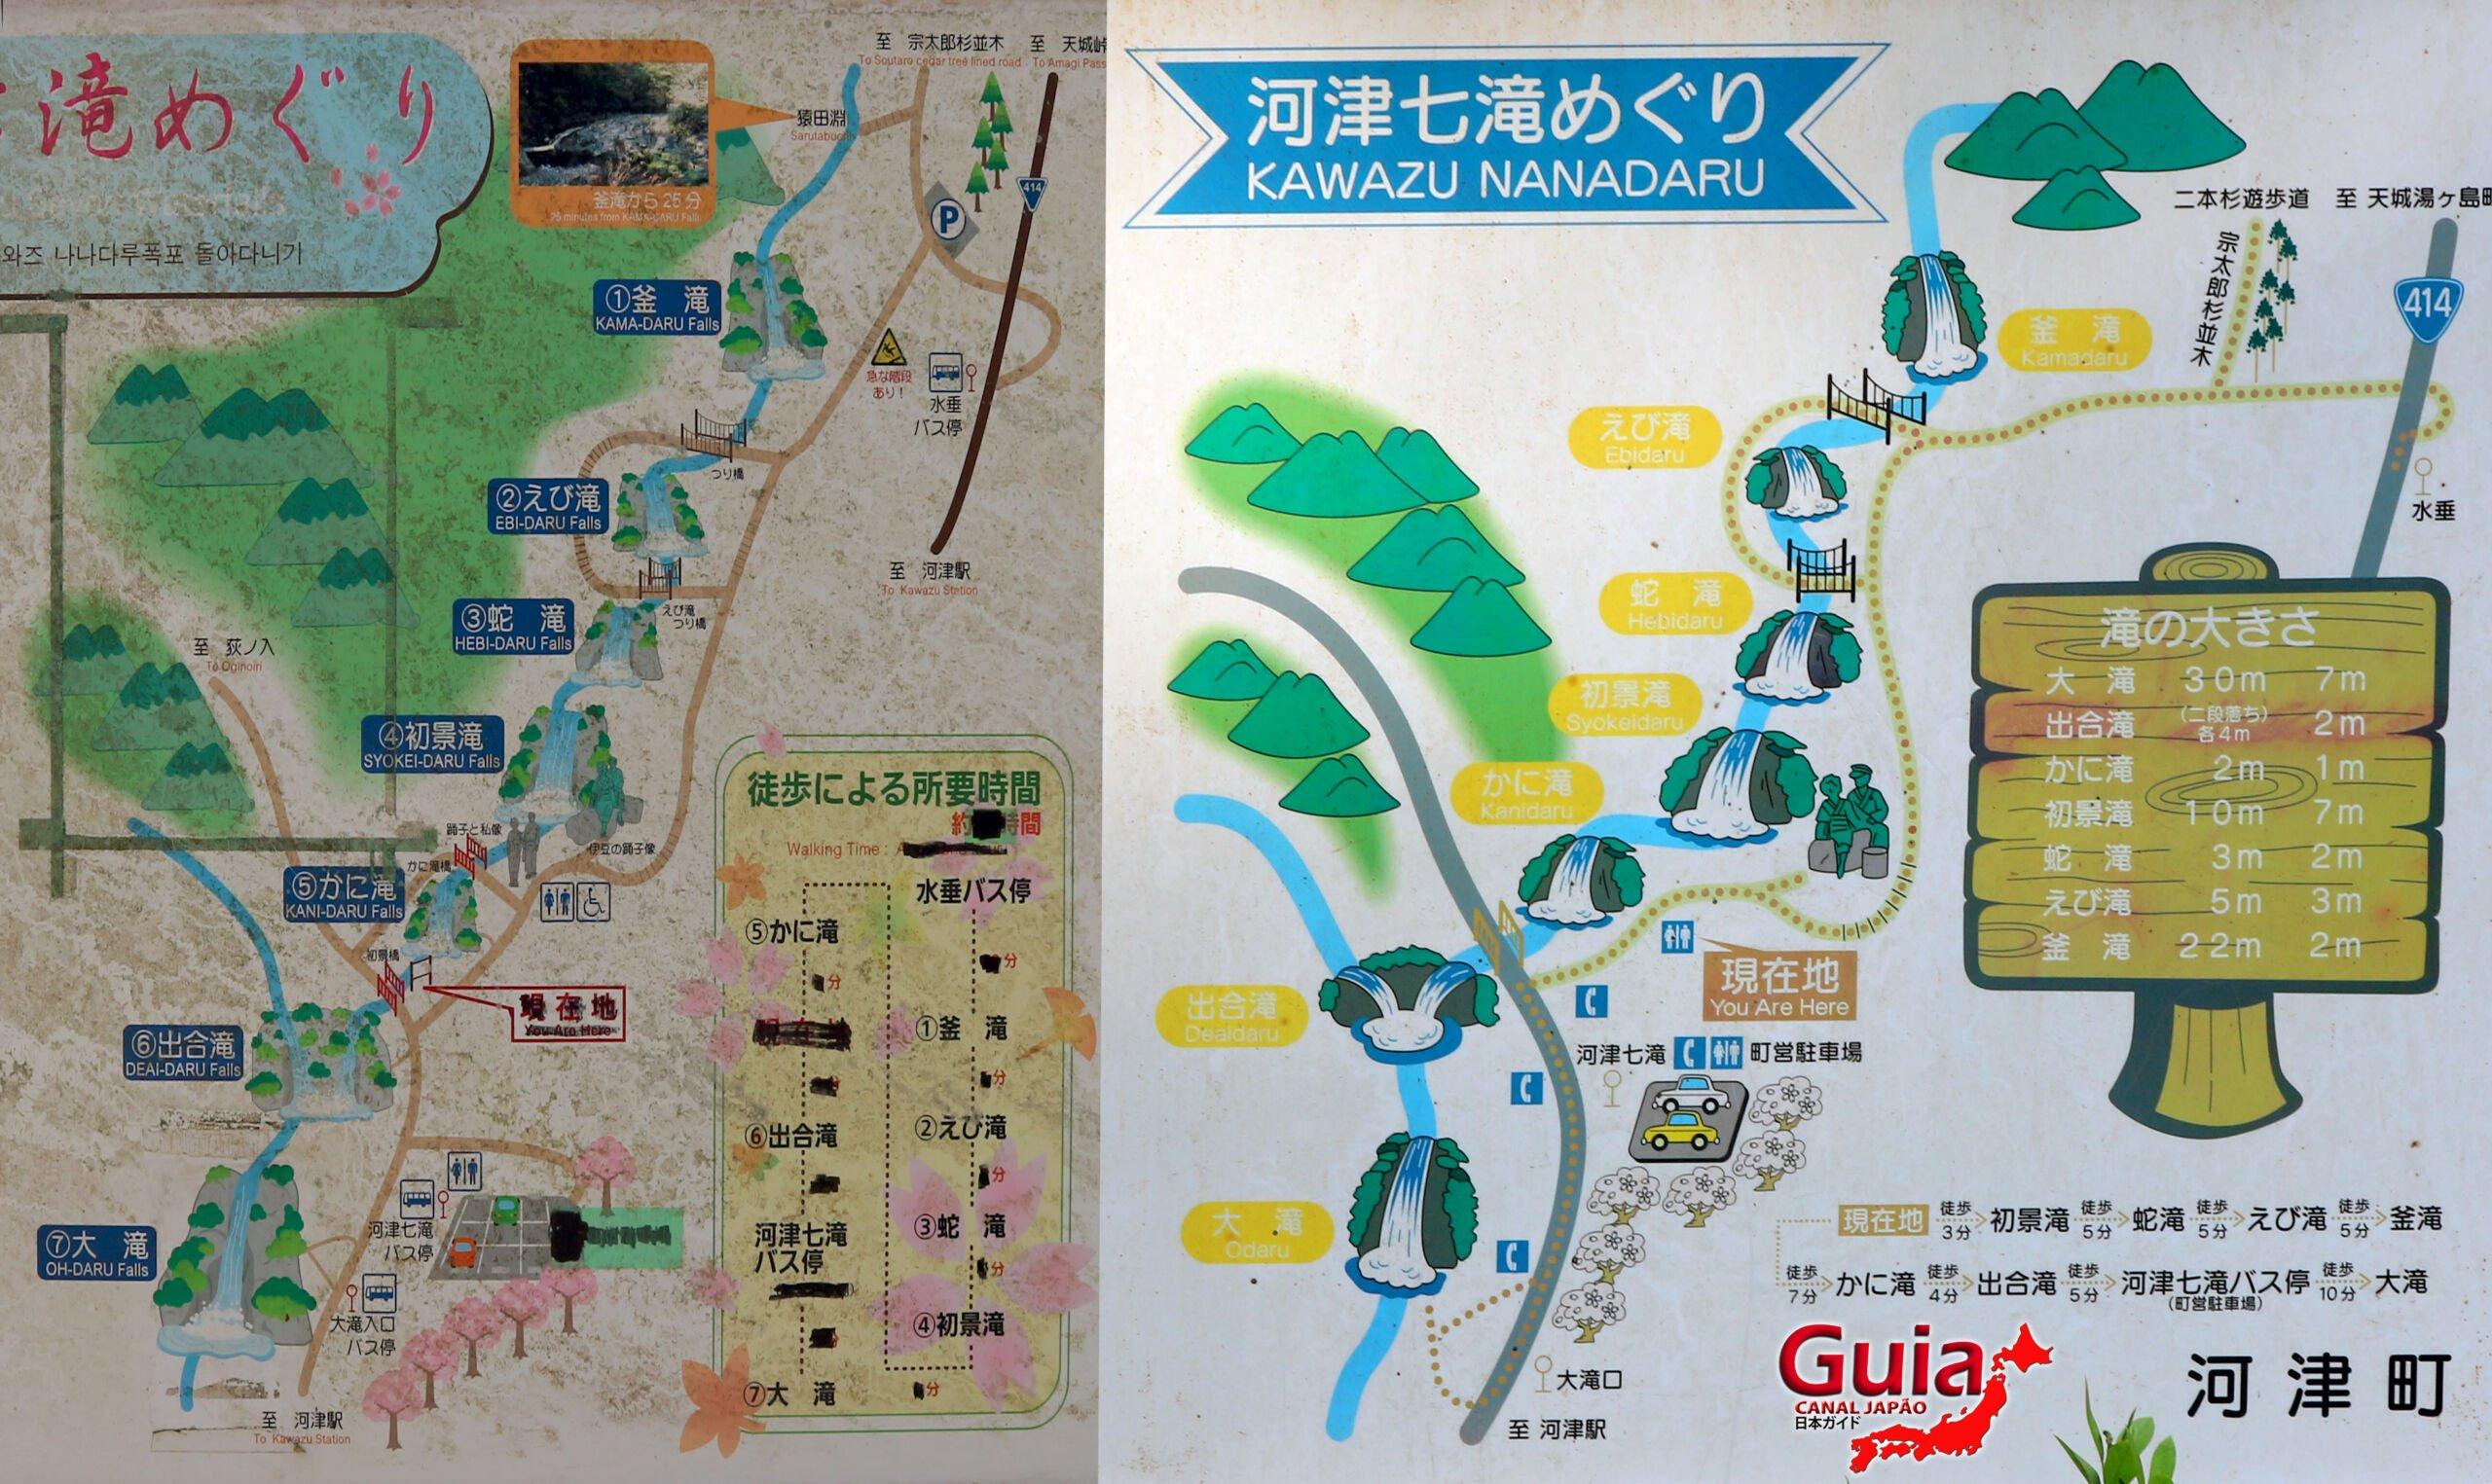 7 Cachoeira de Kawazu Nanadaru - 河津 七 滝 3